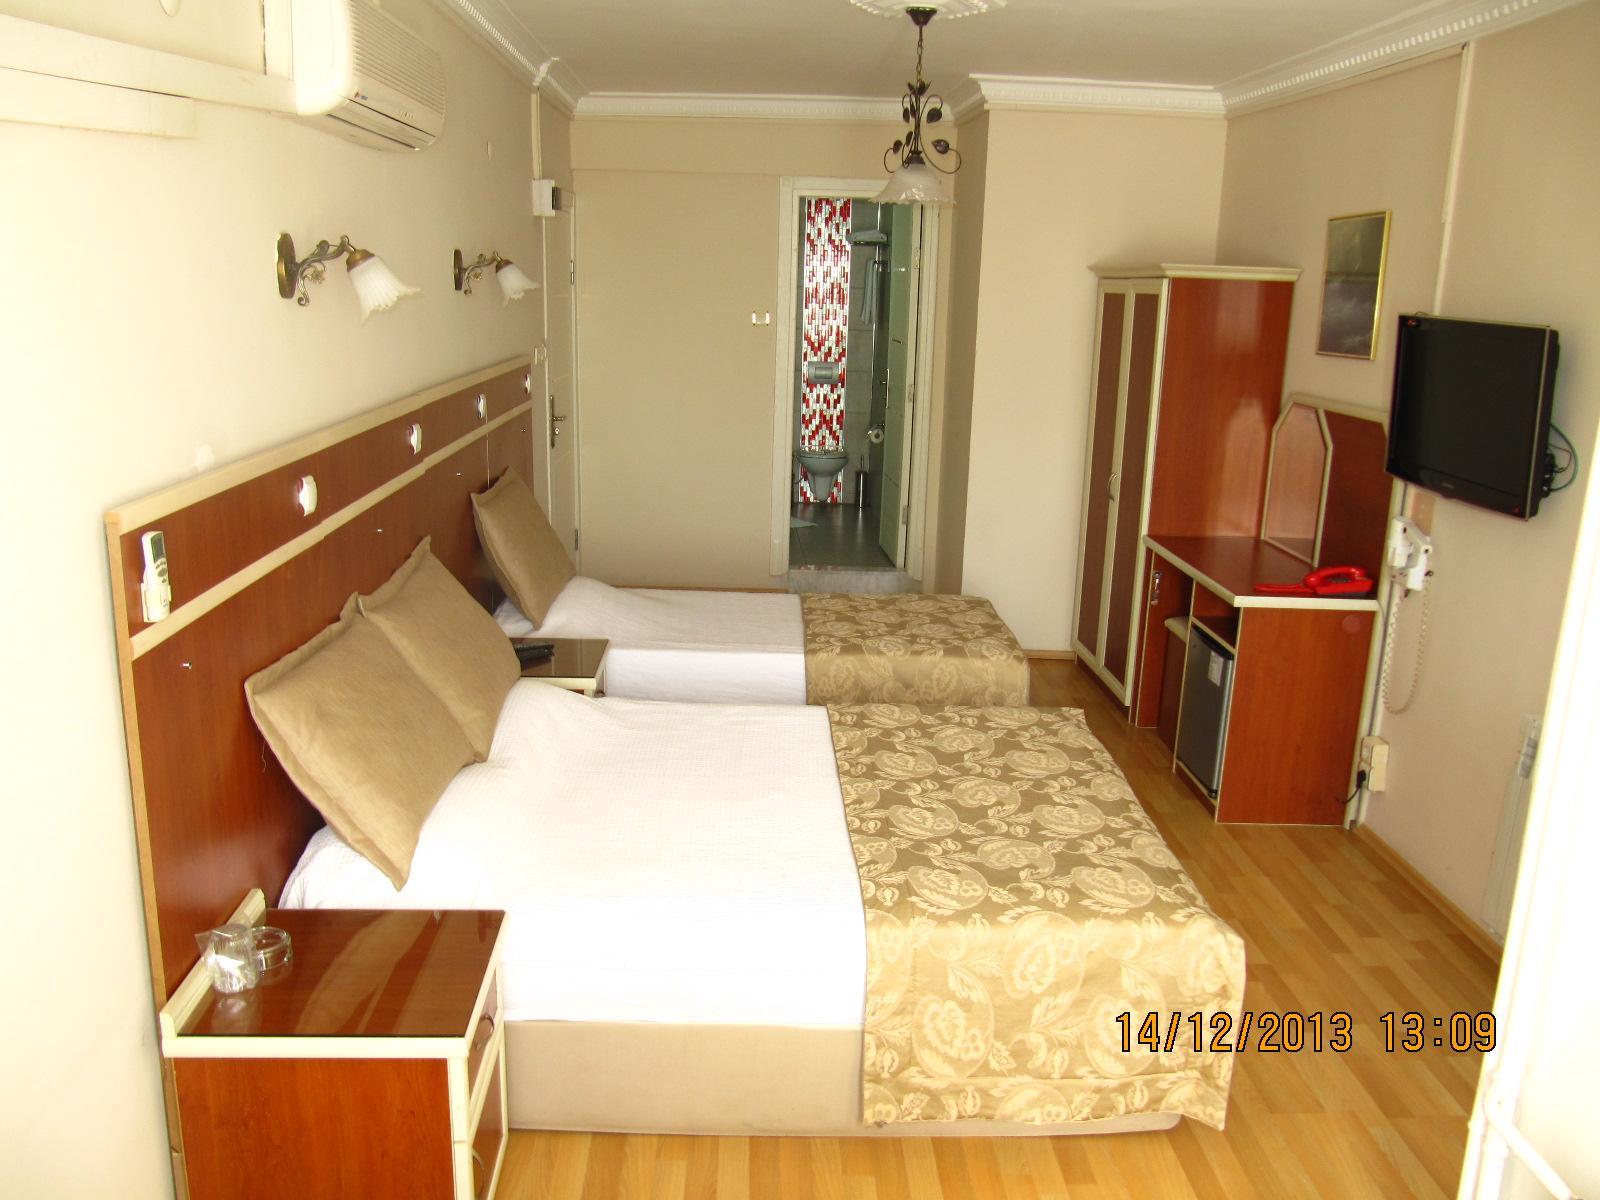 Ayvazali Hotel, Bergama